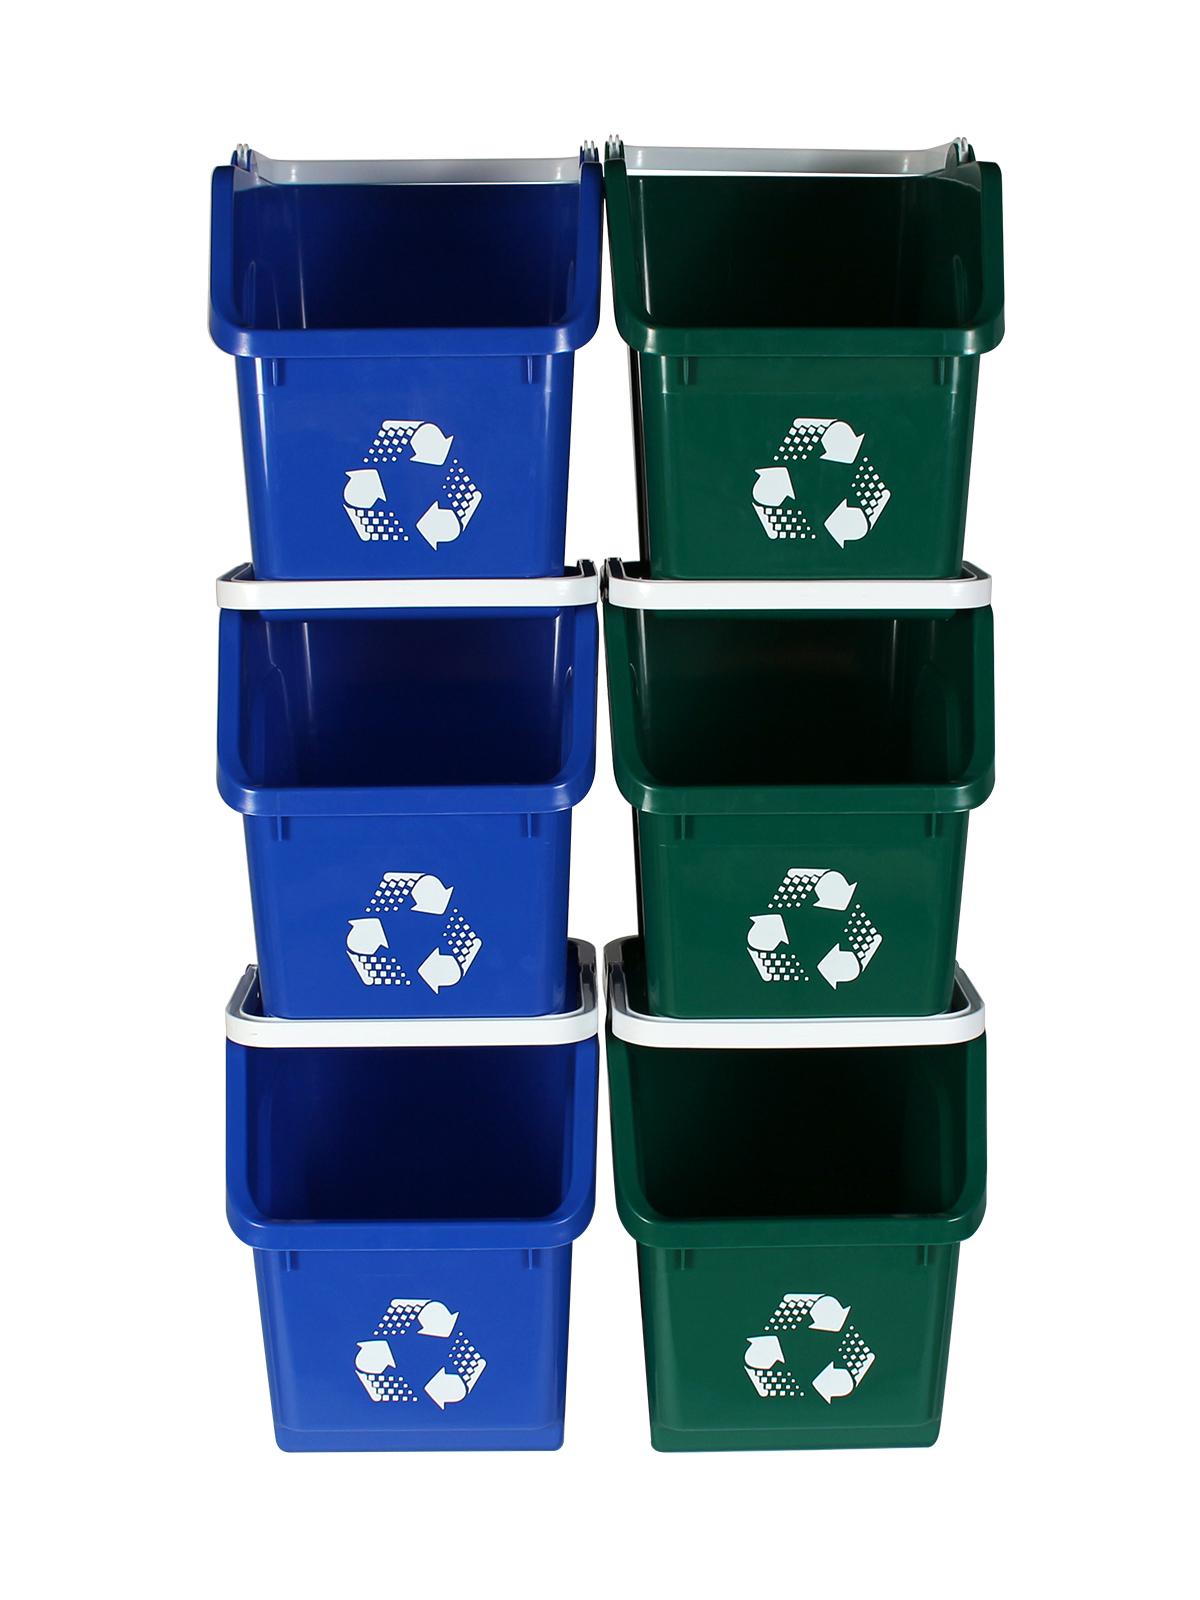 MULTI RECYCLER (20 Pack) - Double - Mobius Loop - Full - Blue-Green